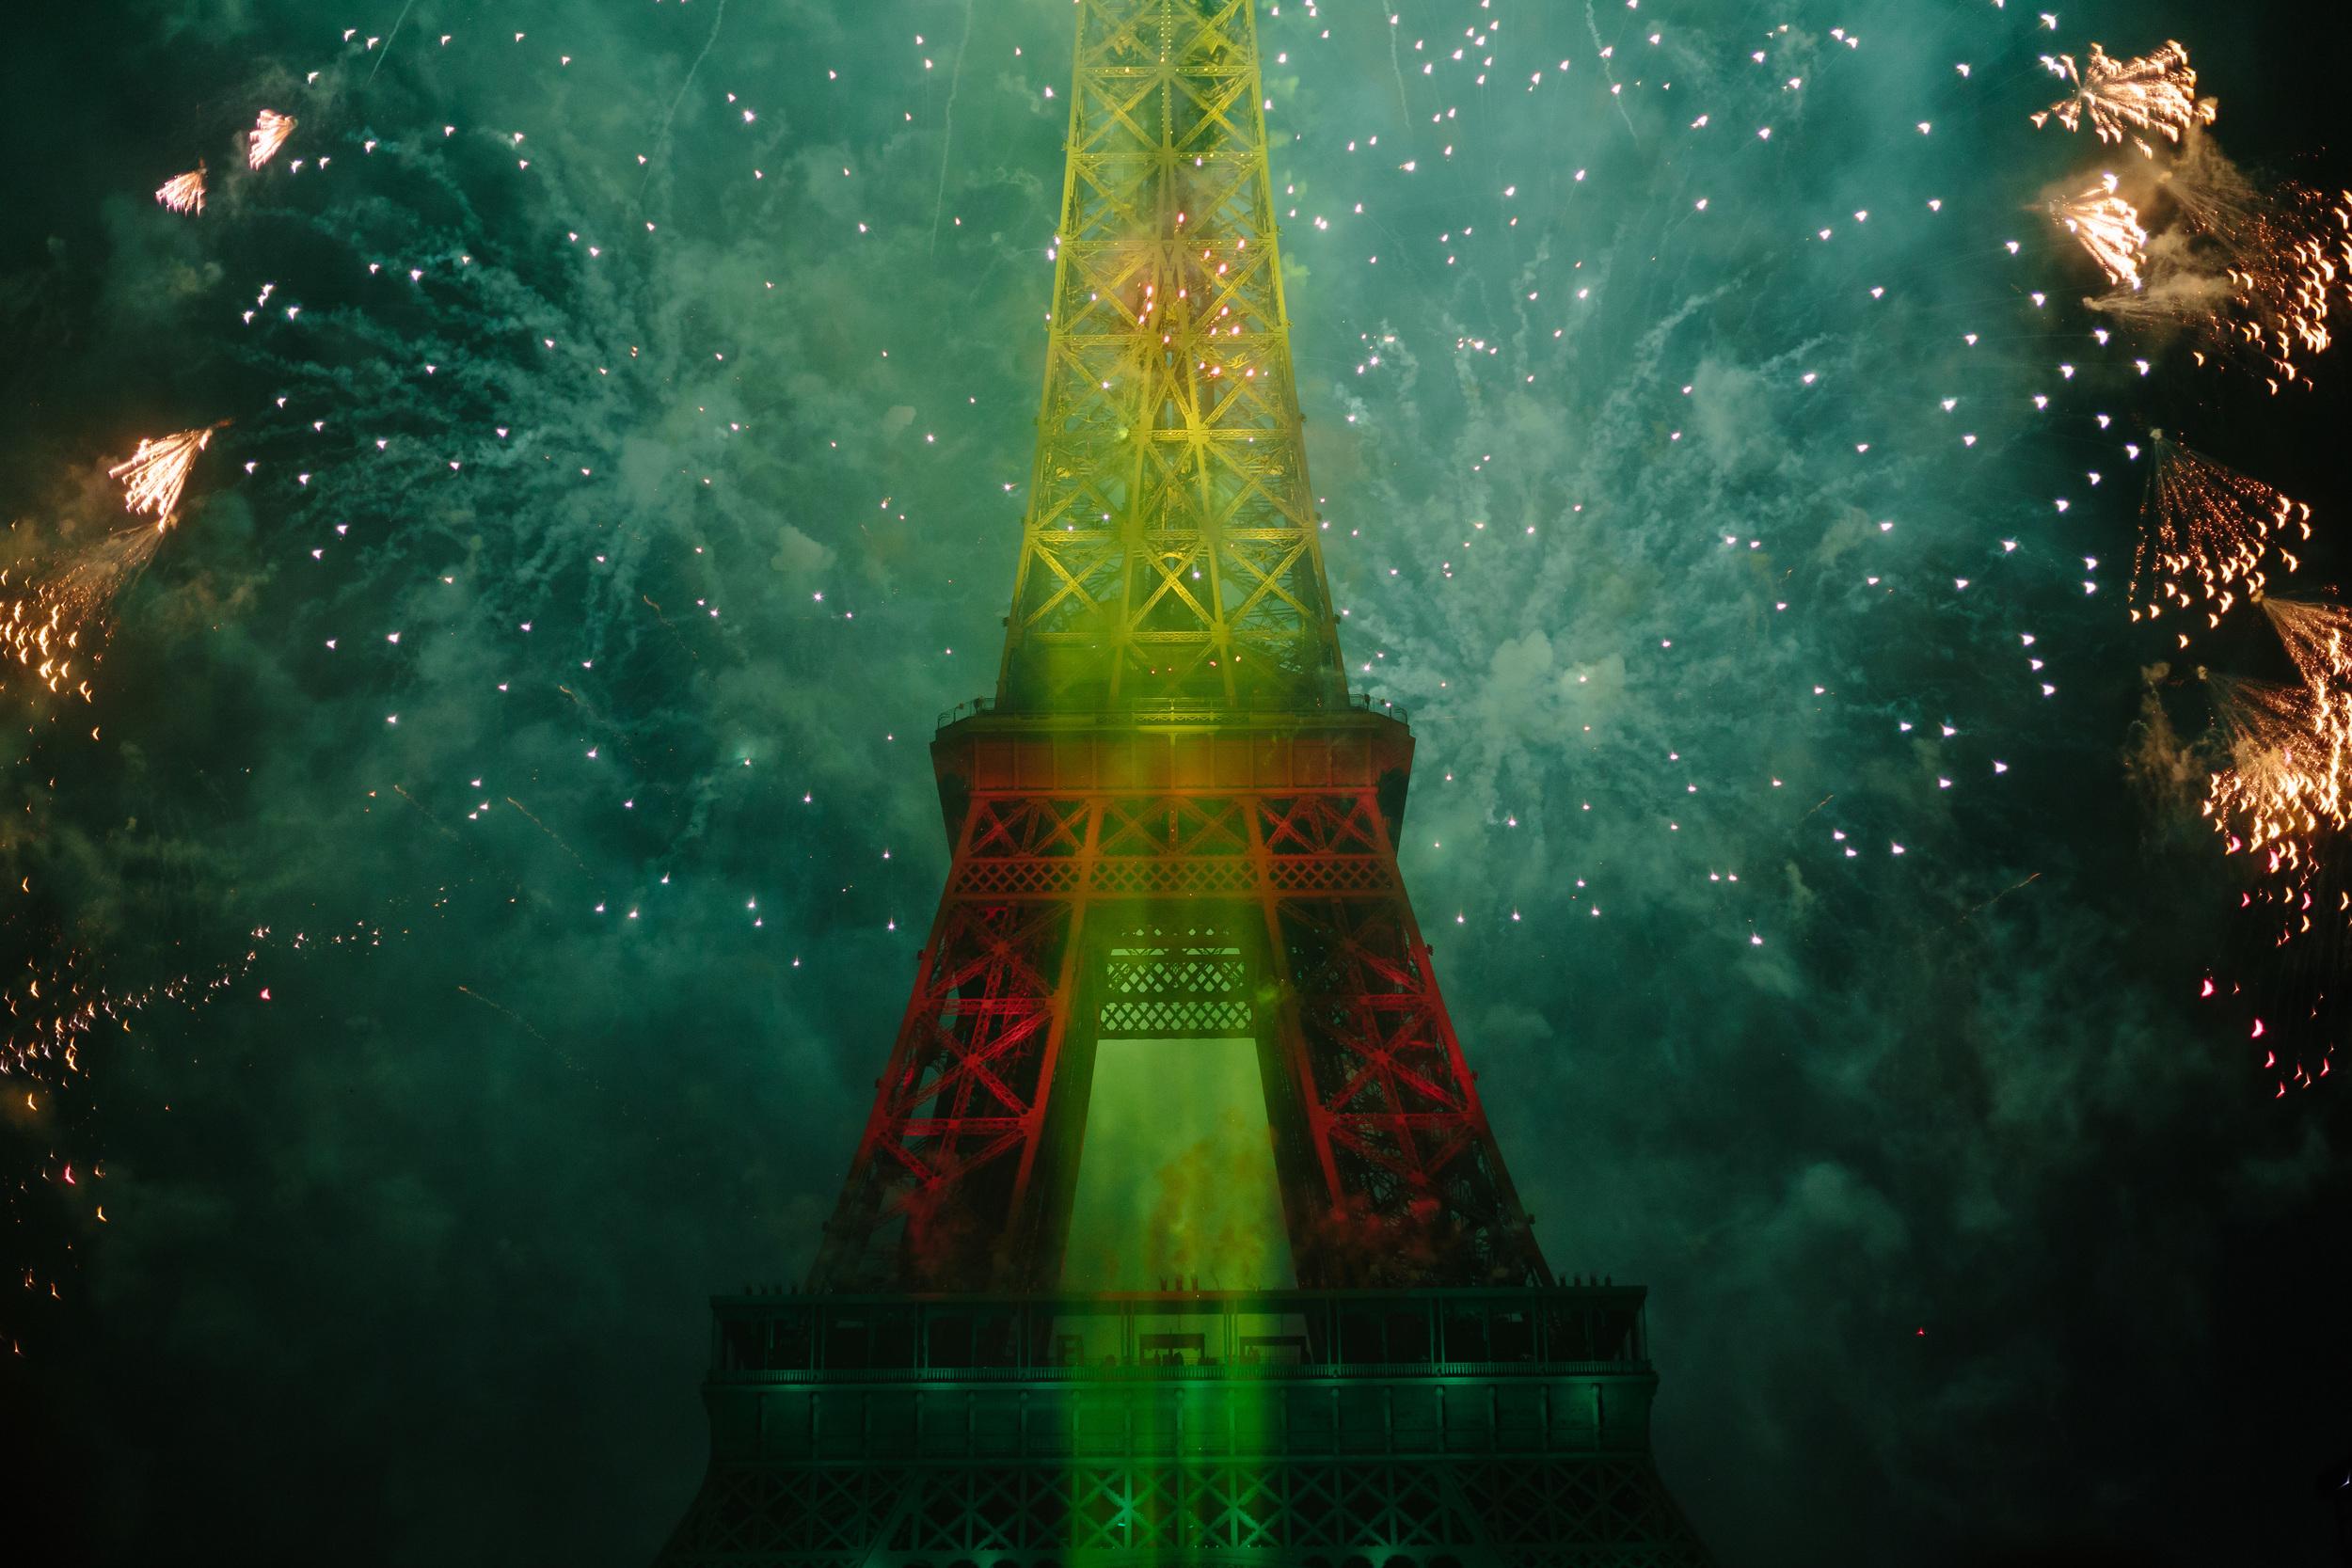 Photographer in Paris, Bastille, 14 July, Eiffel Tower, Iheartparisfr